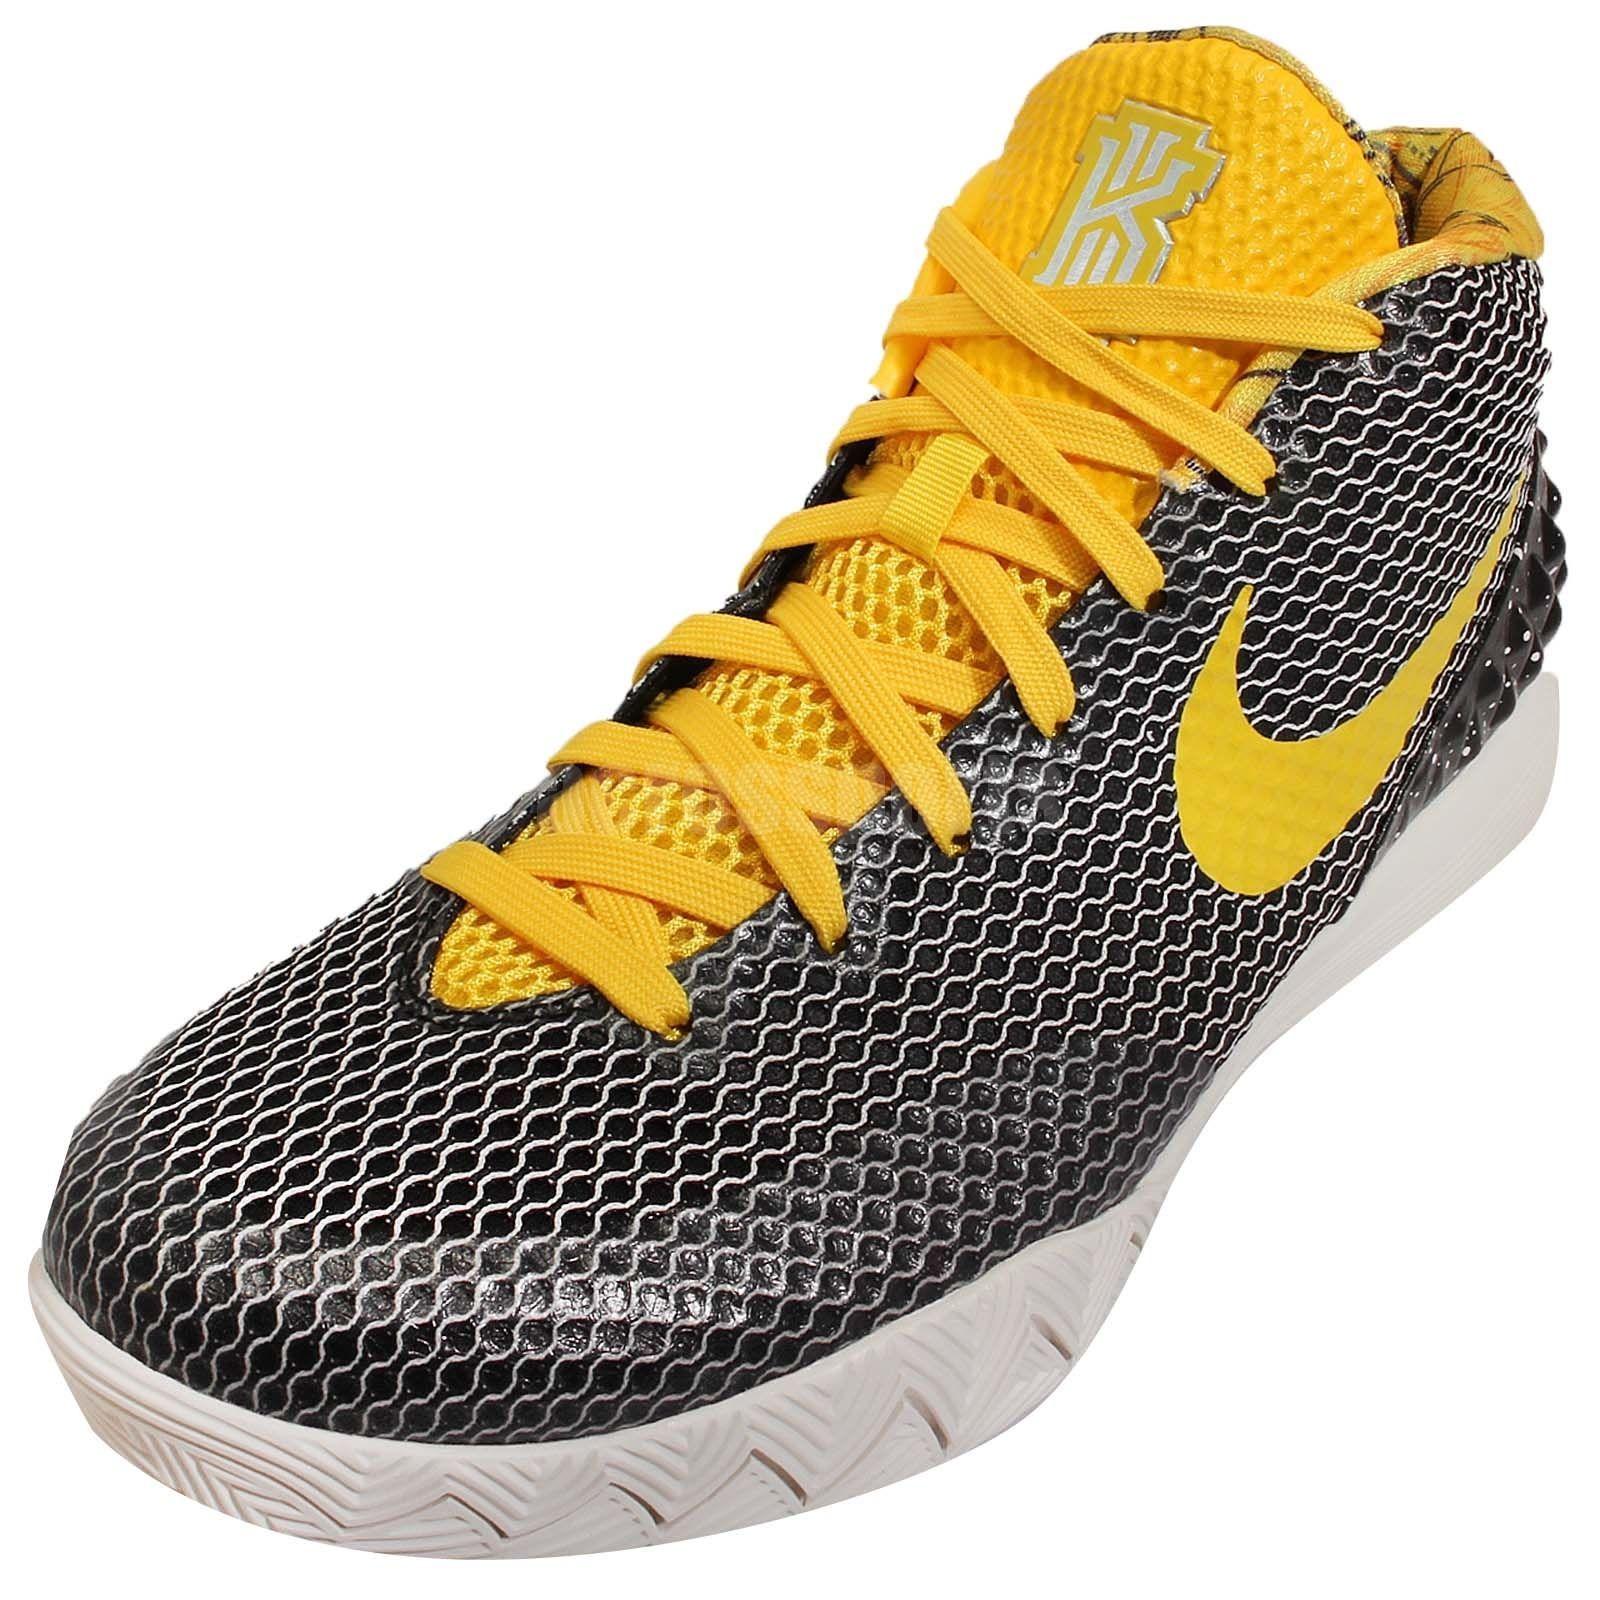 Nike Kyrie 1 LMT EP Irving Rise Black Tour Yellow Sail 812559 071